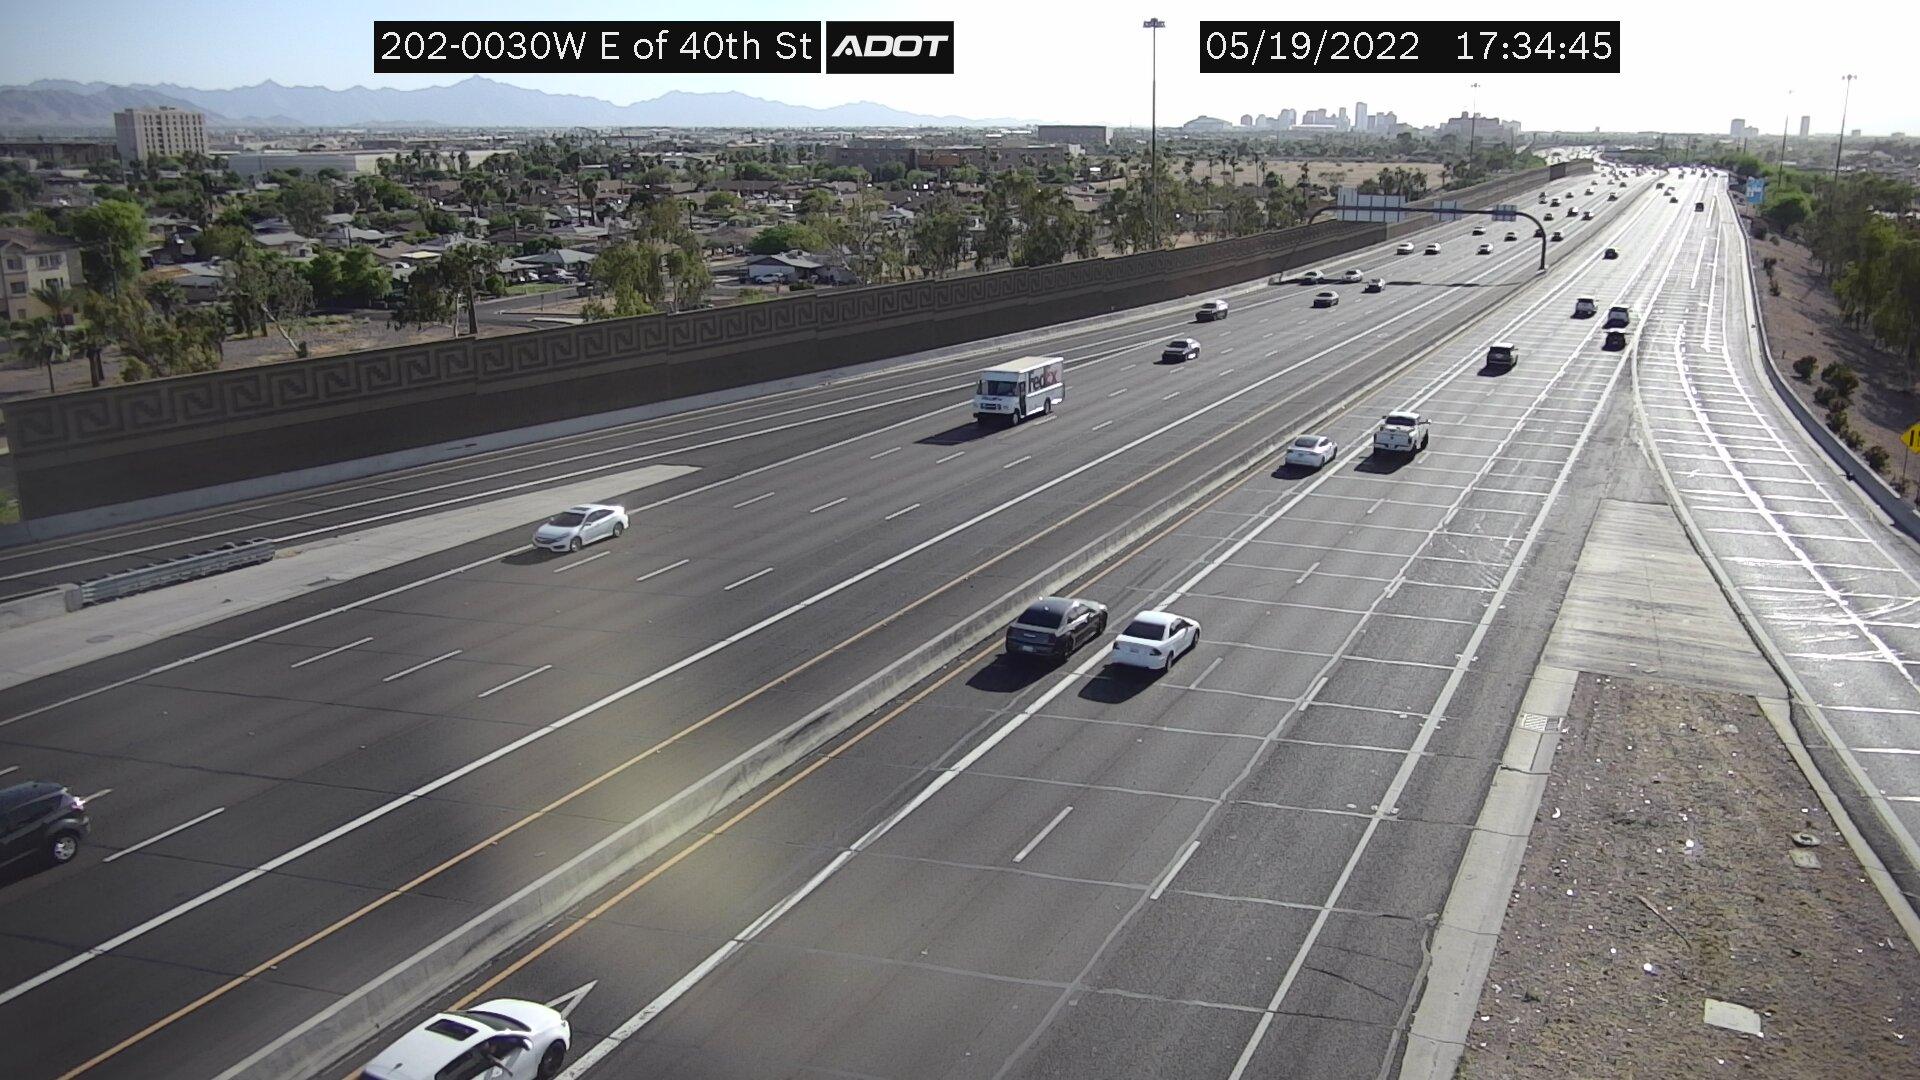 E of 40th St WB (L202) (202) - Phoenix and Arizona